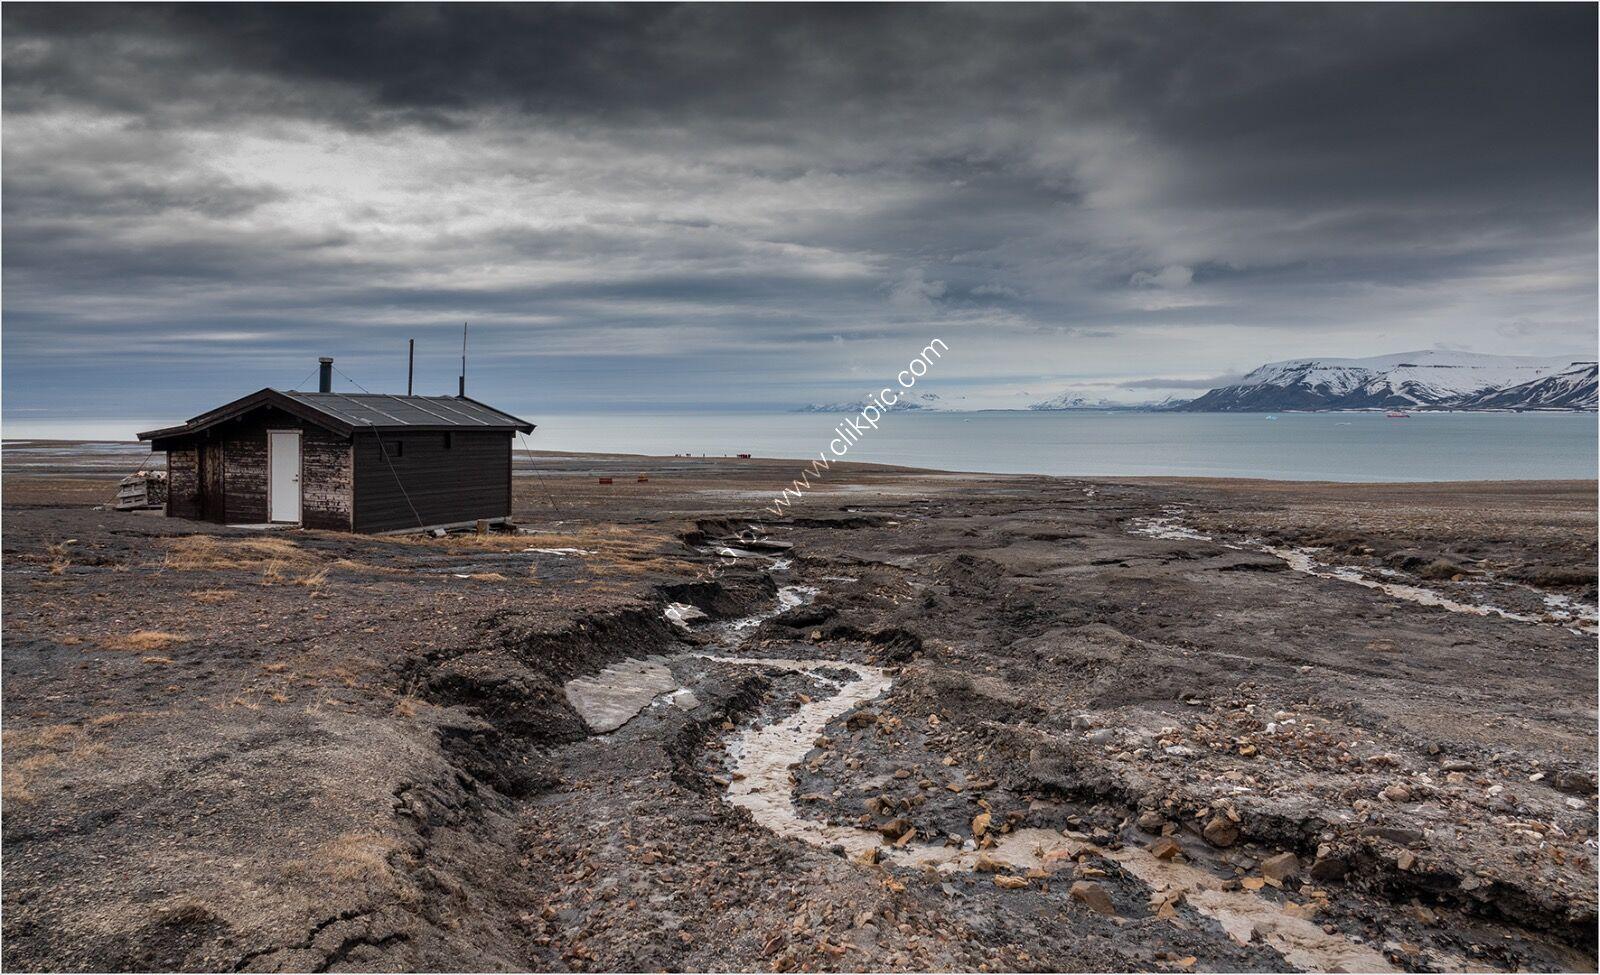 Mick Parmenter-Hikers hut